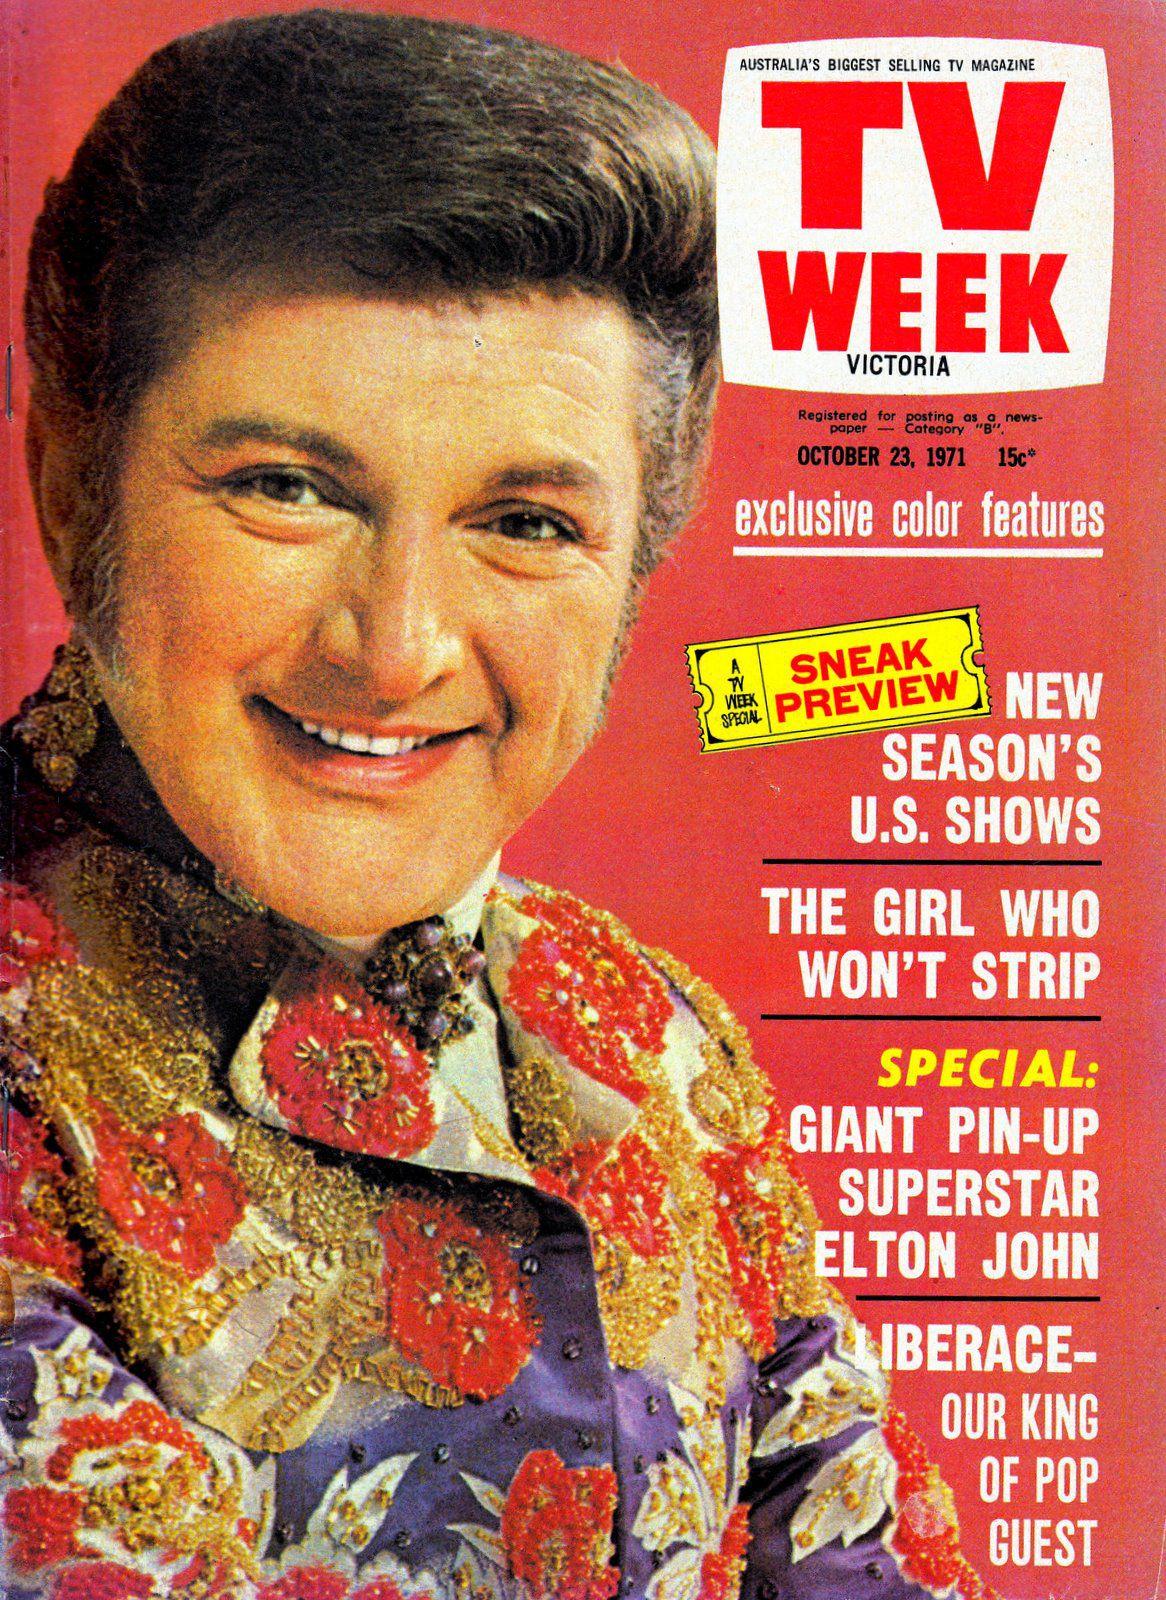 TV Week, Victoria, Australia